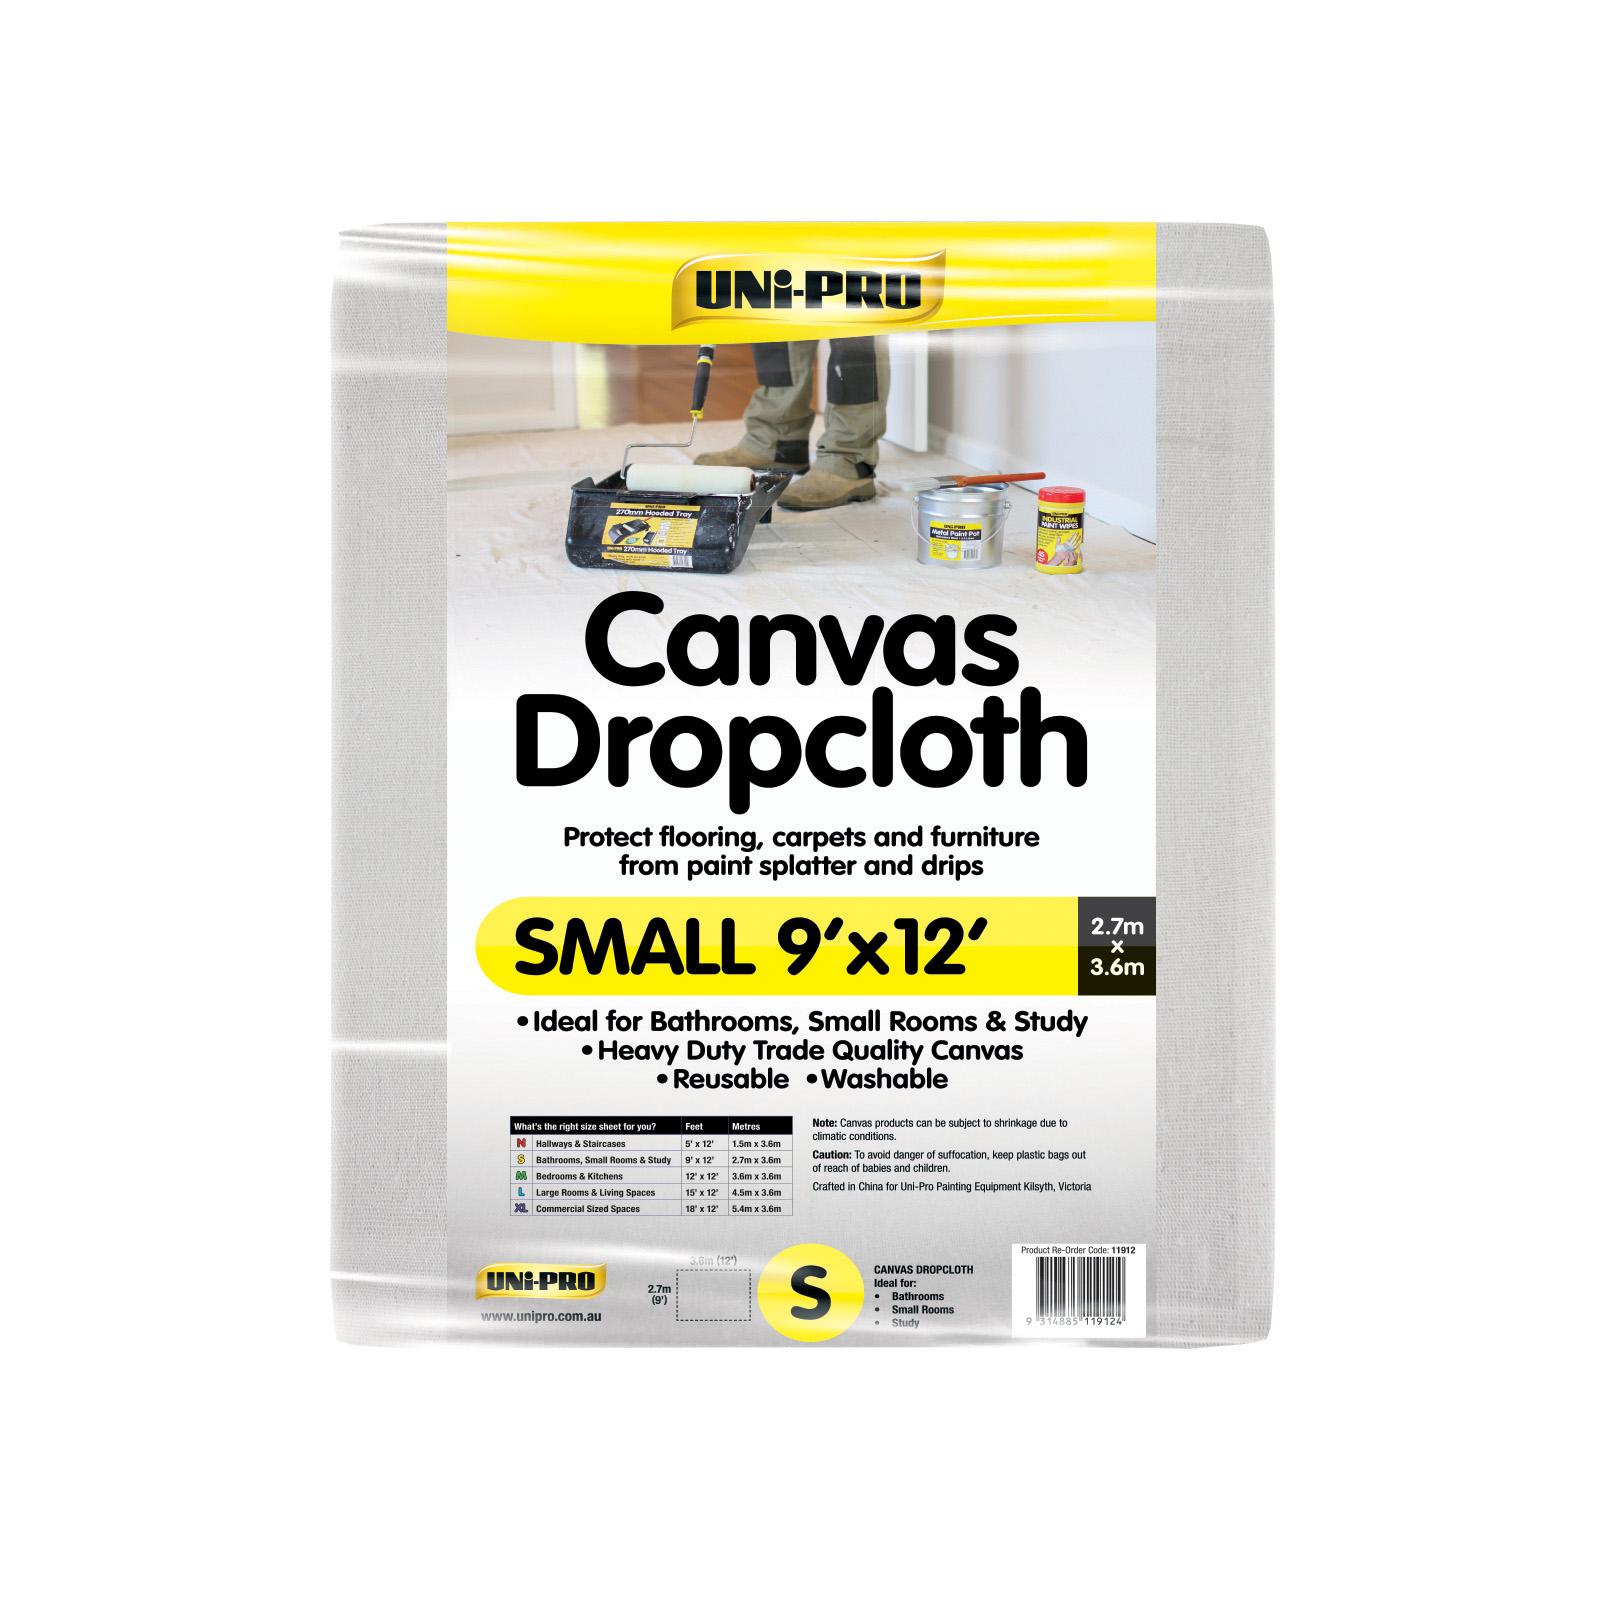 UNi-PRO Heavy Duty Canvas Dropcloth Range